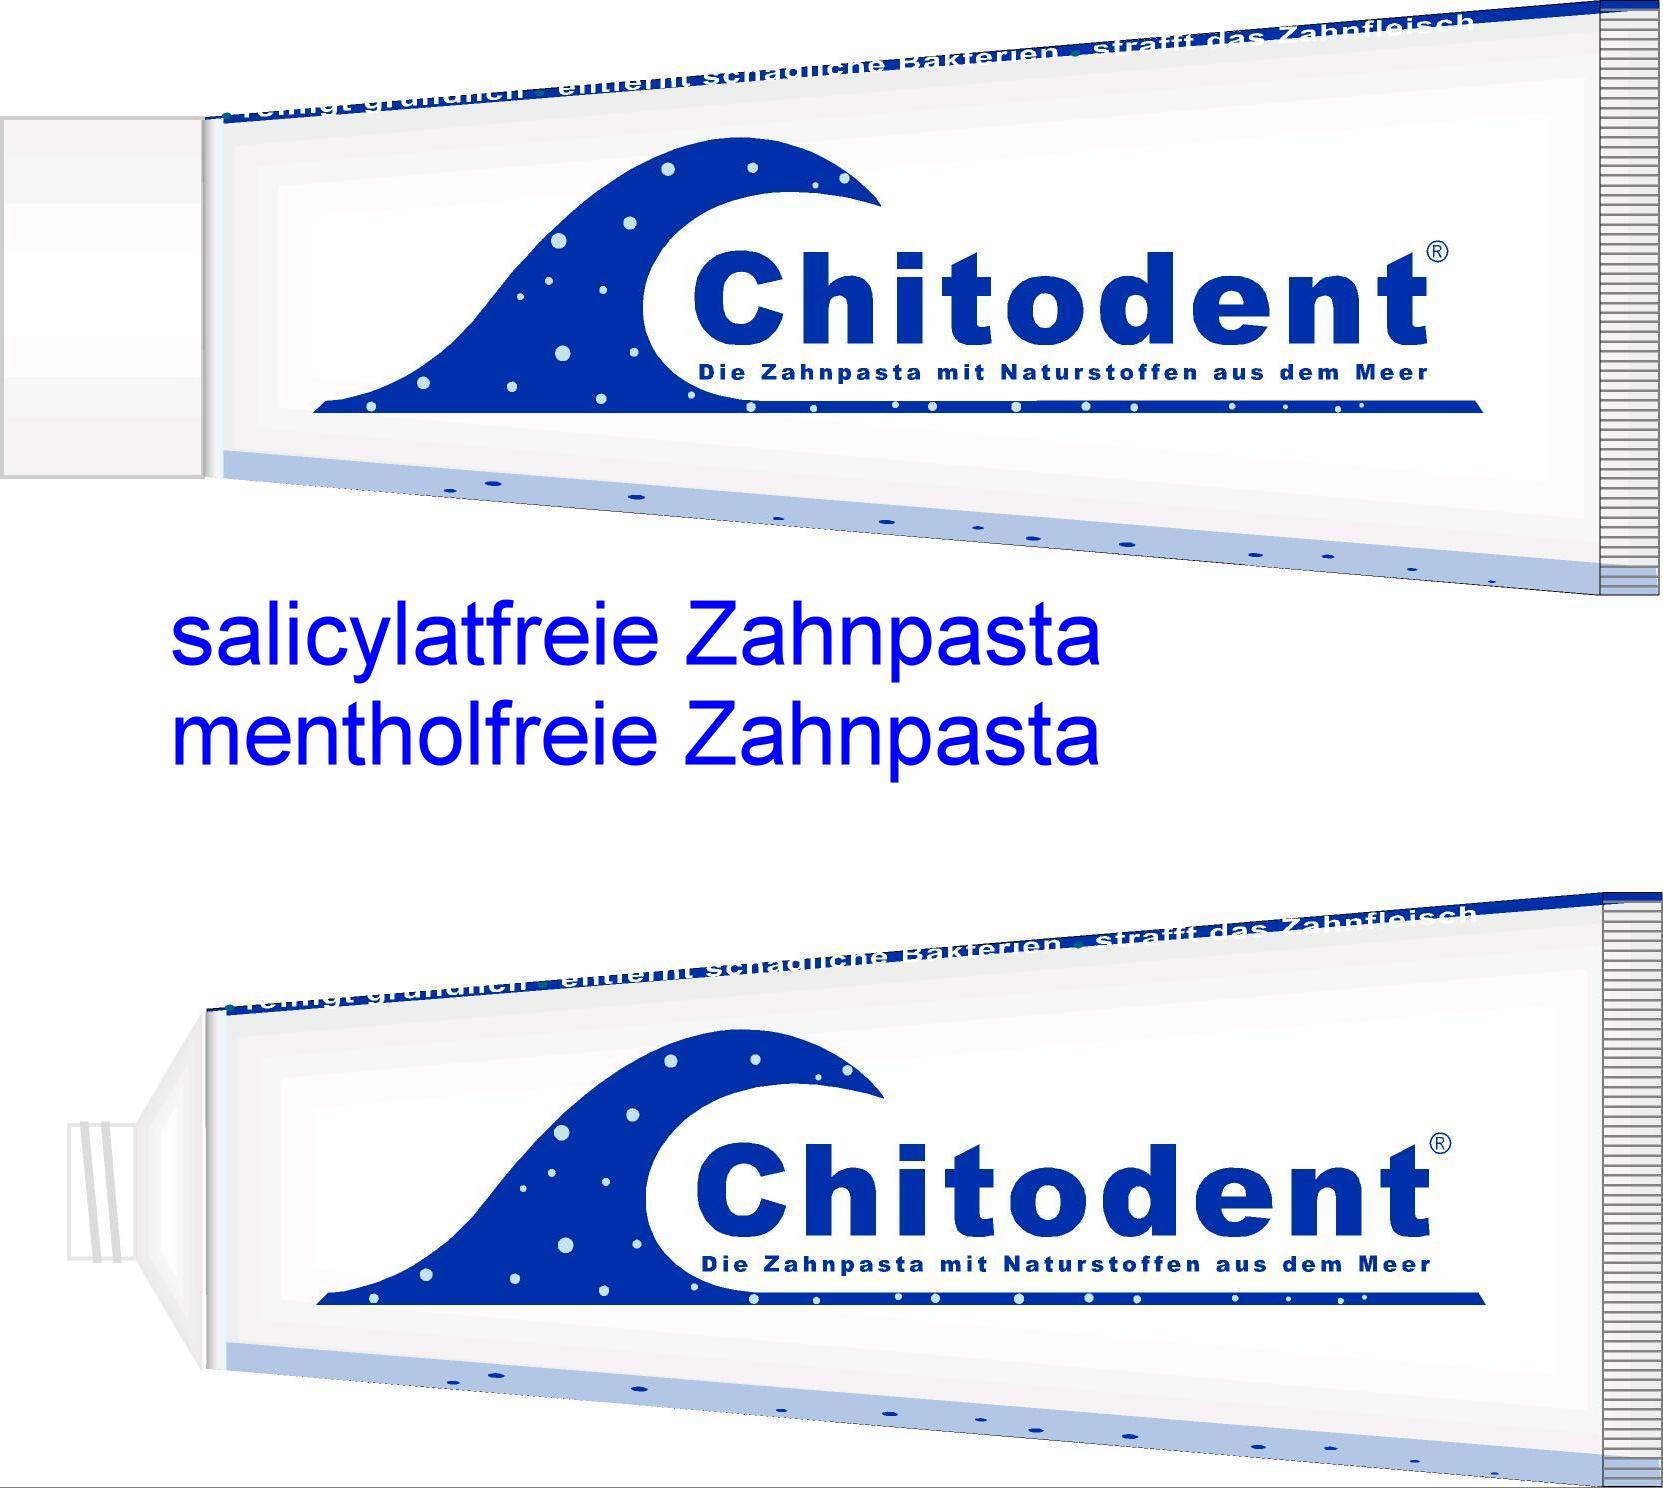 salicylatfreie Zahnpasta,mentholfreie Zahnpasta